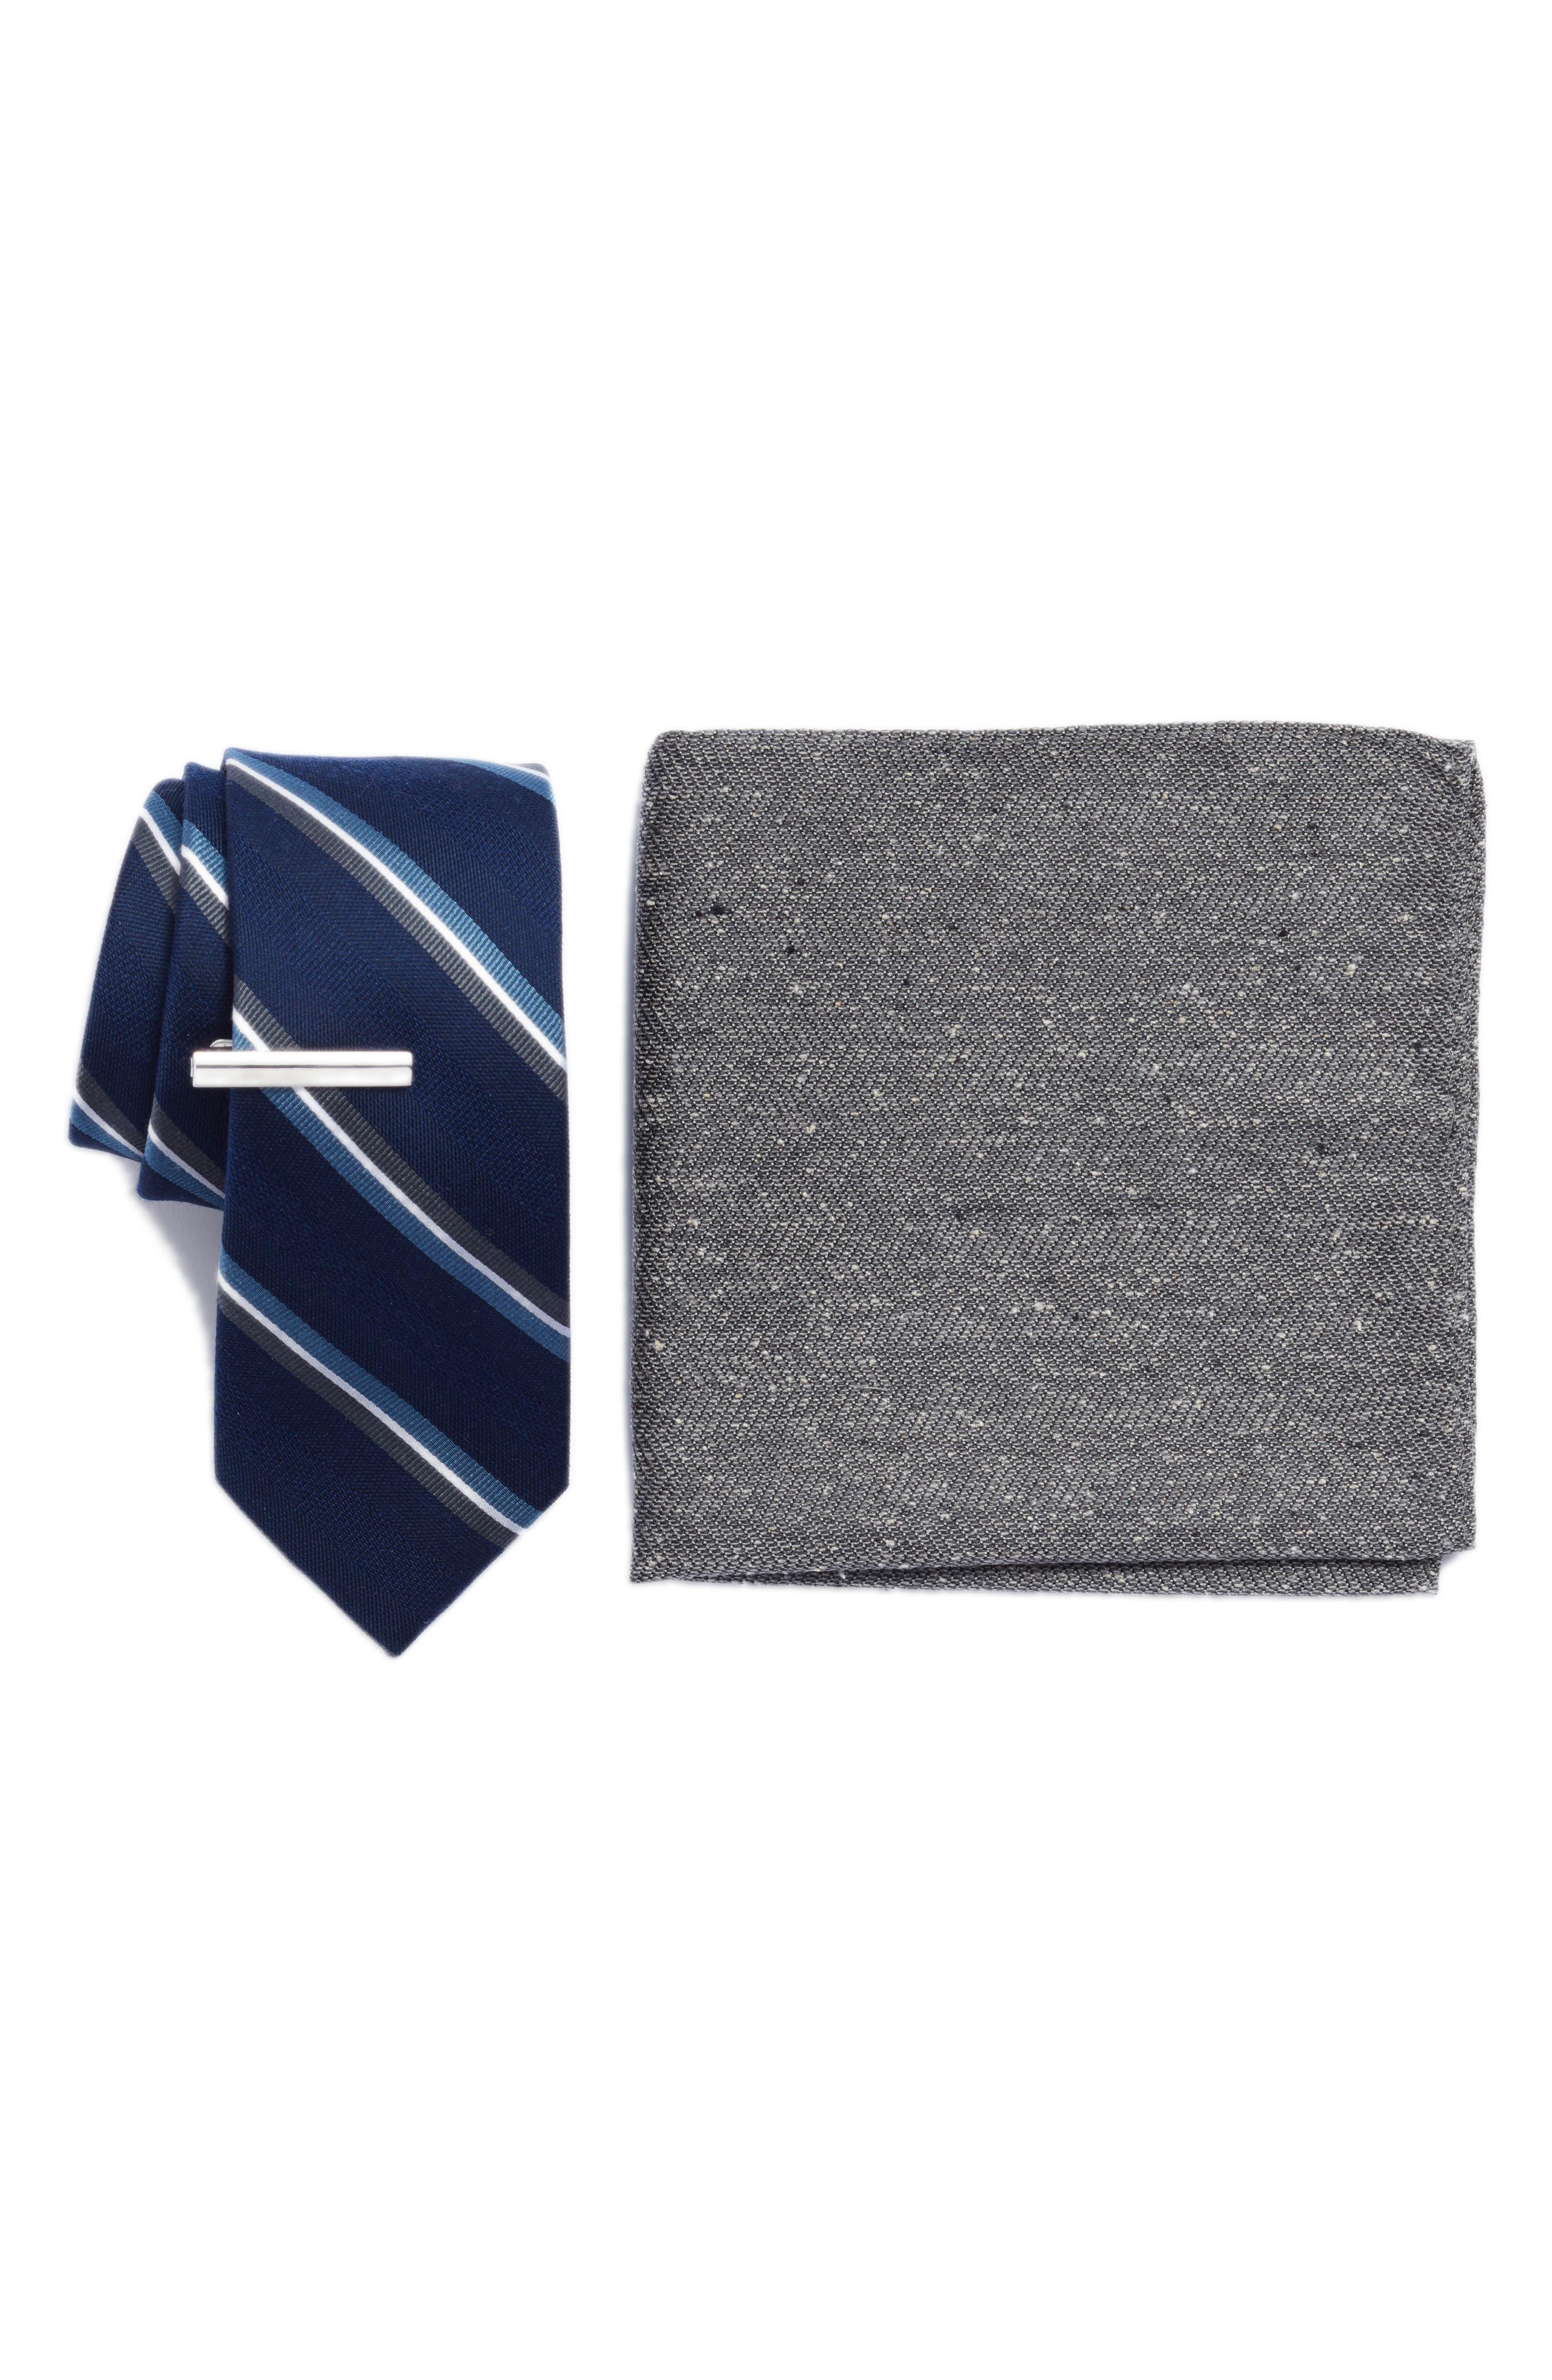 THE TIE BAR Short Cut Stripe 3-Piece Skinny Tie Style Box, Main, color, 410